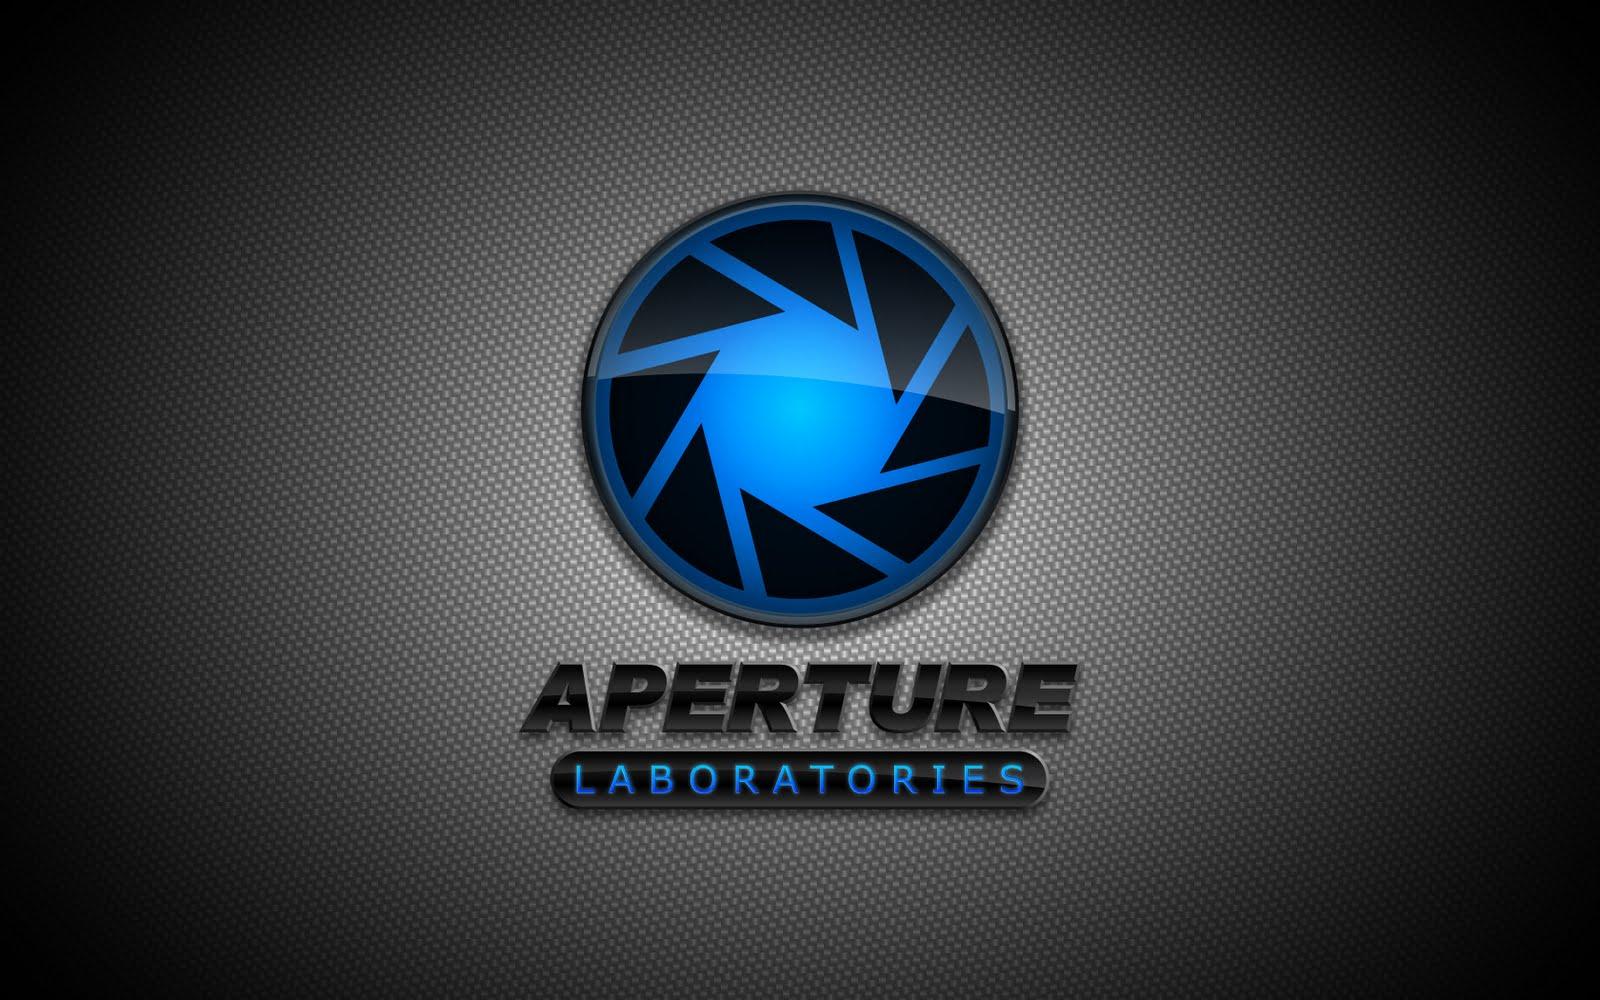 Portal 2 HD Logo Desktop Wallpapers Download Wallpapers in HD for 1600x1000